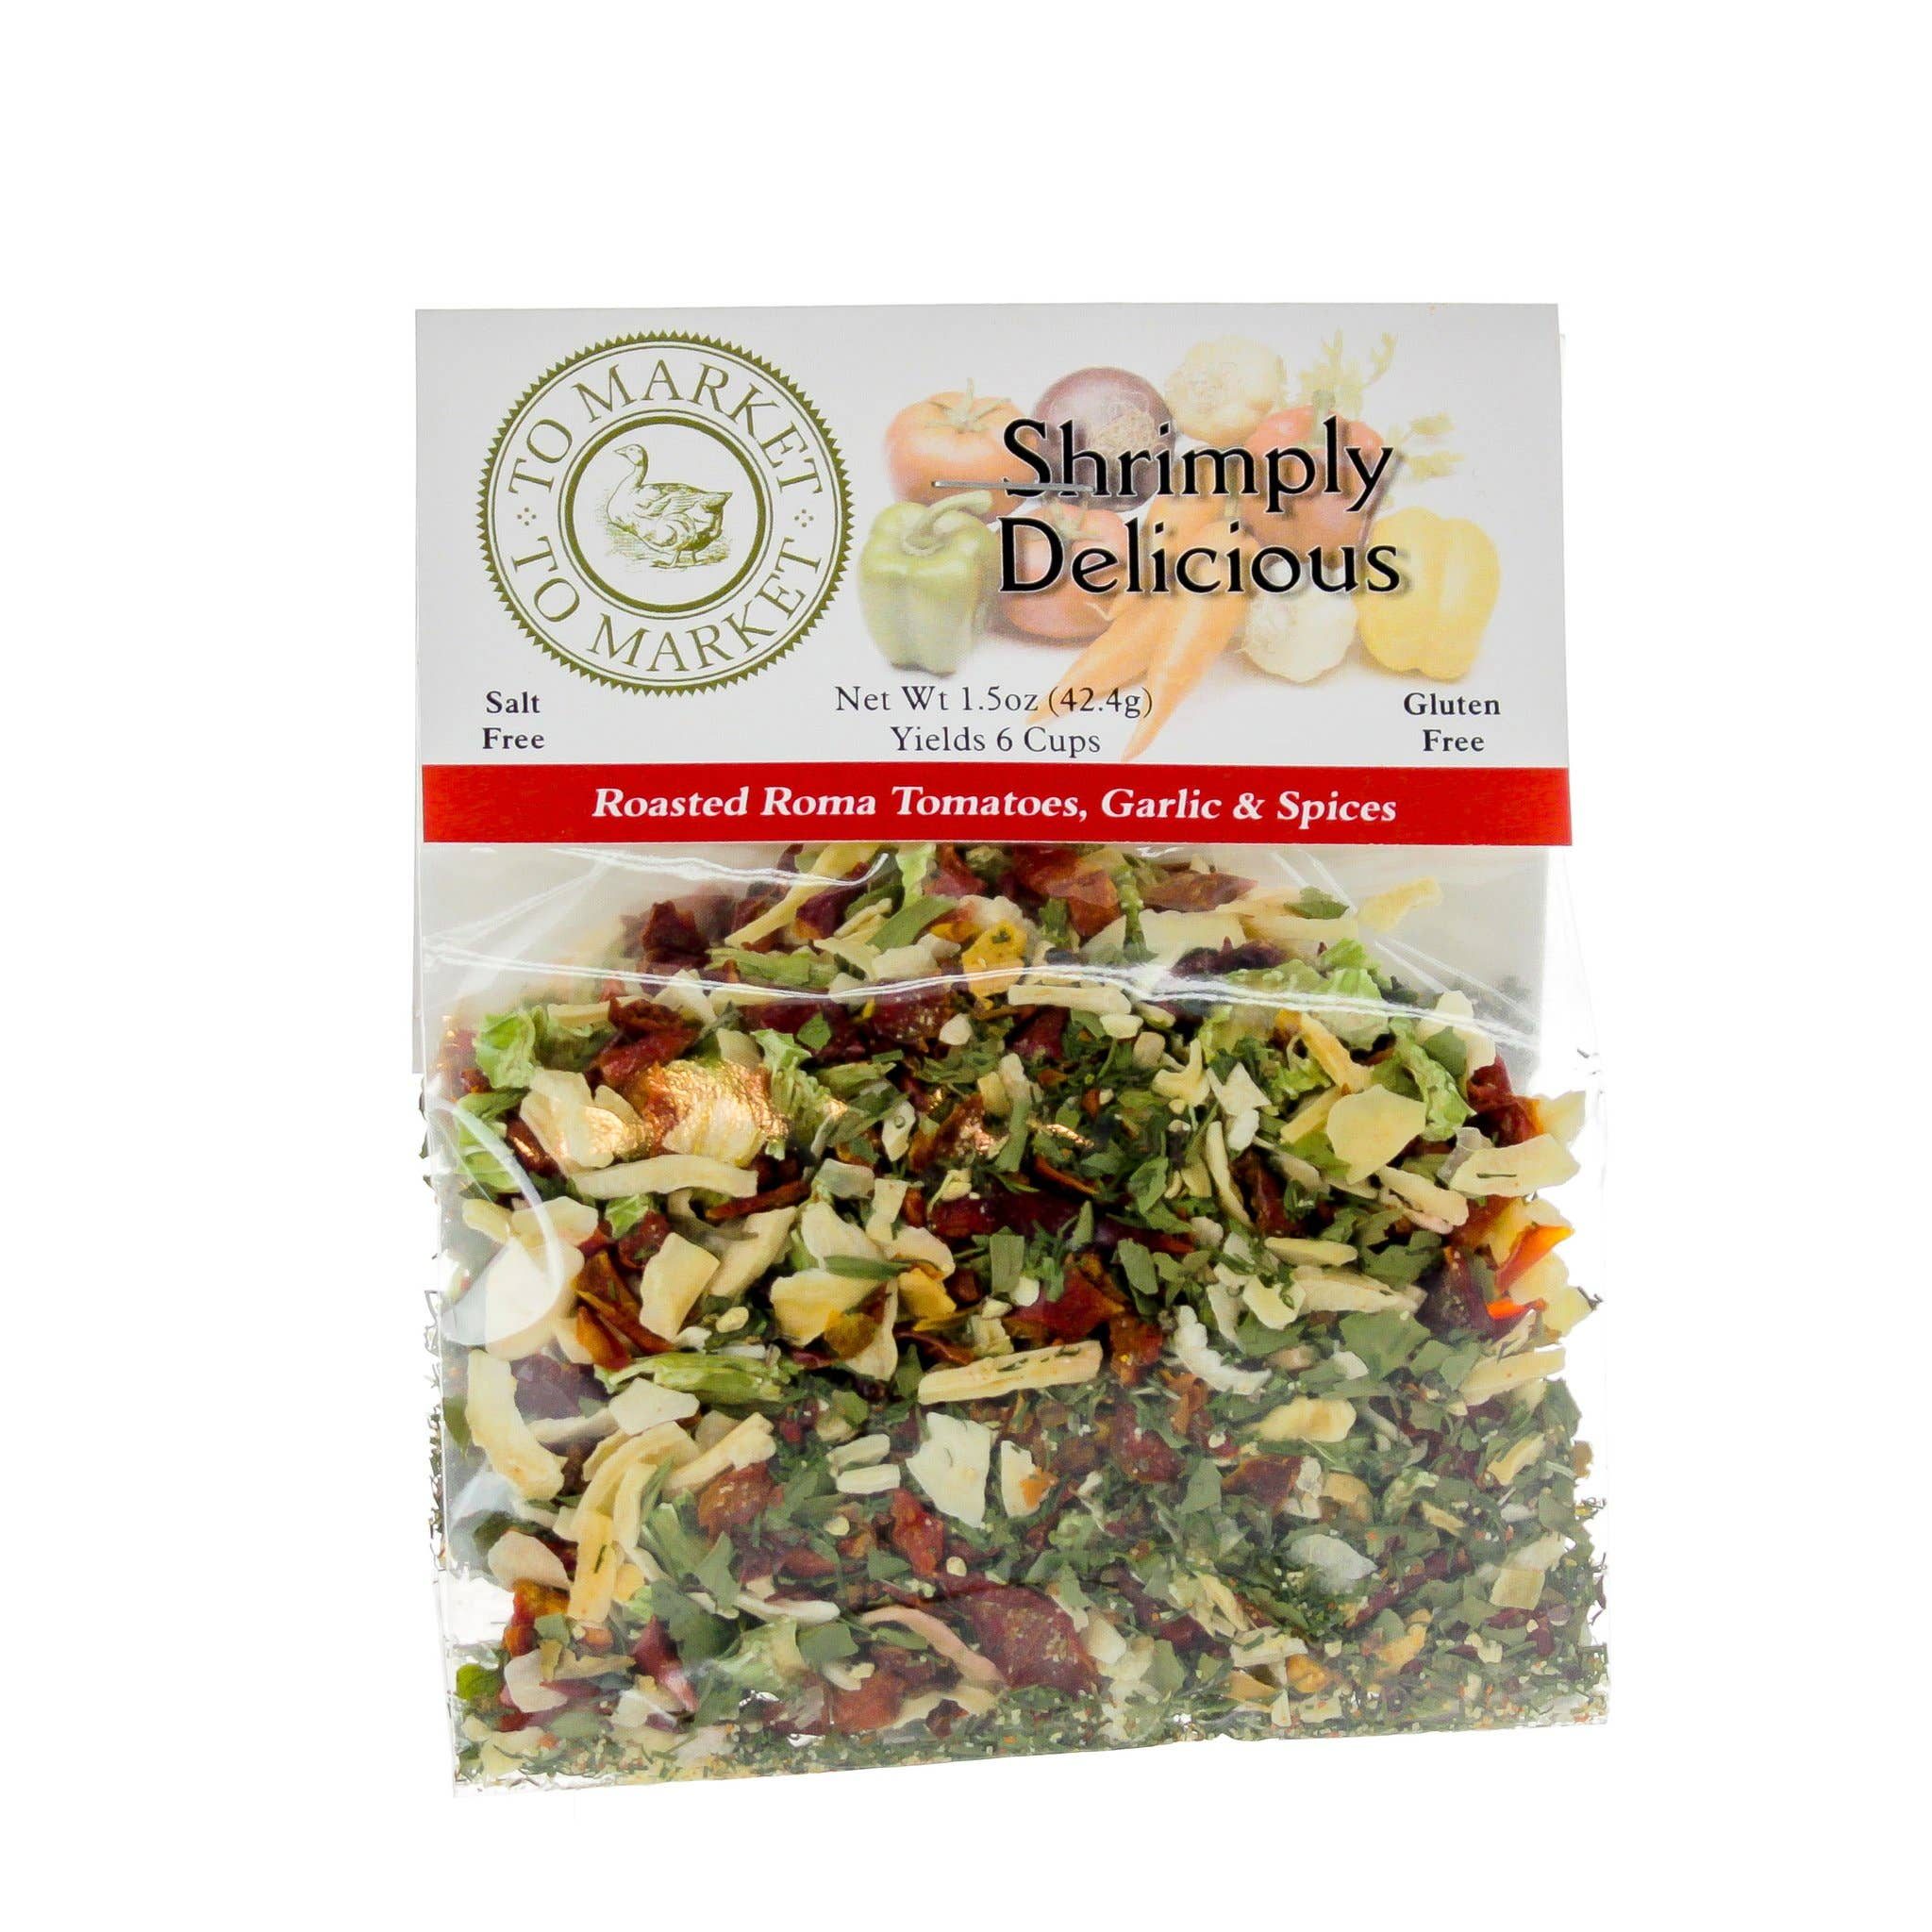 Shrimply Delicious Spice | Trada Marketplace